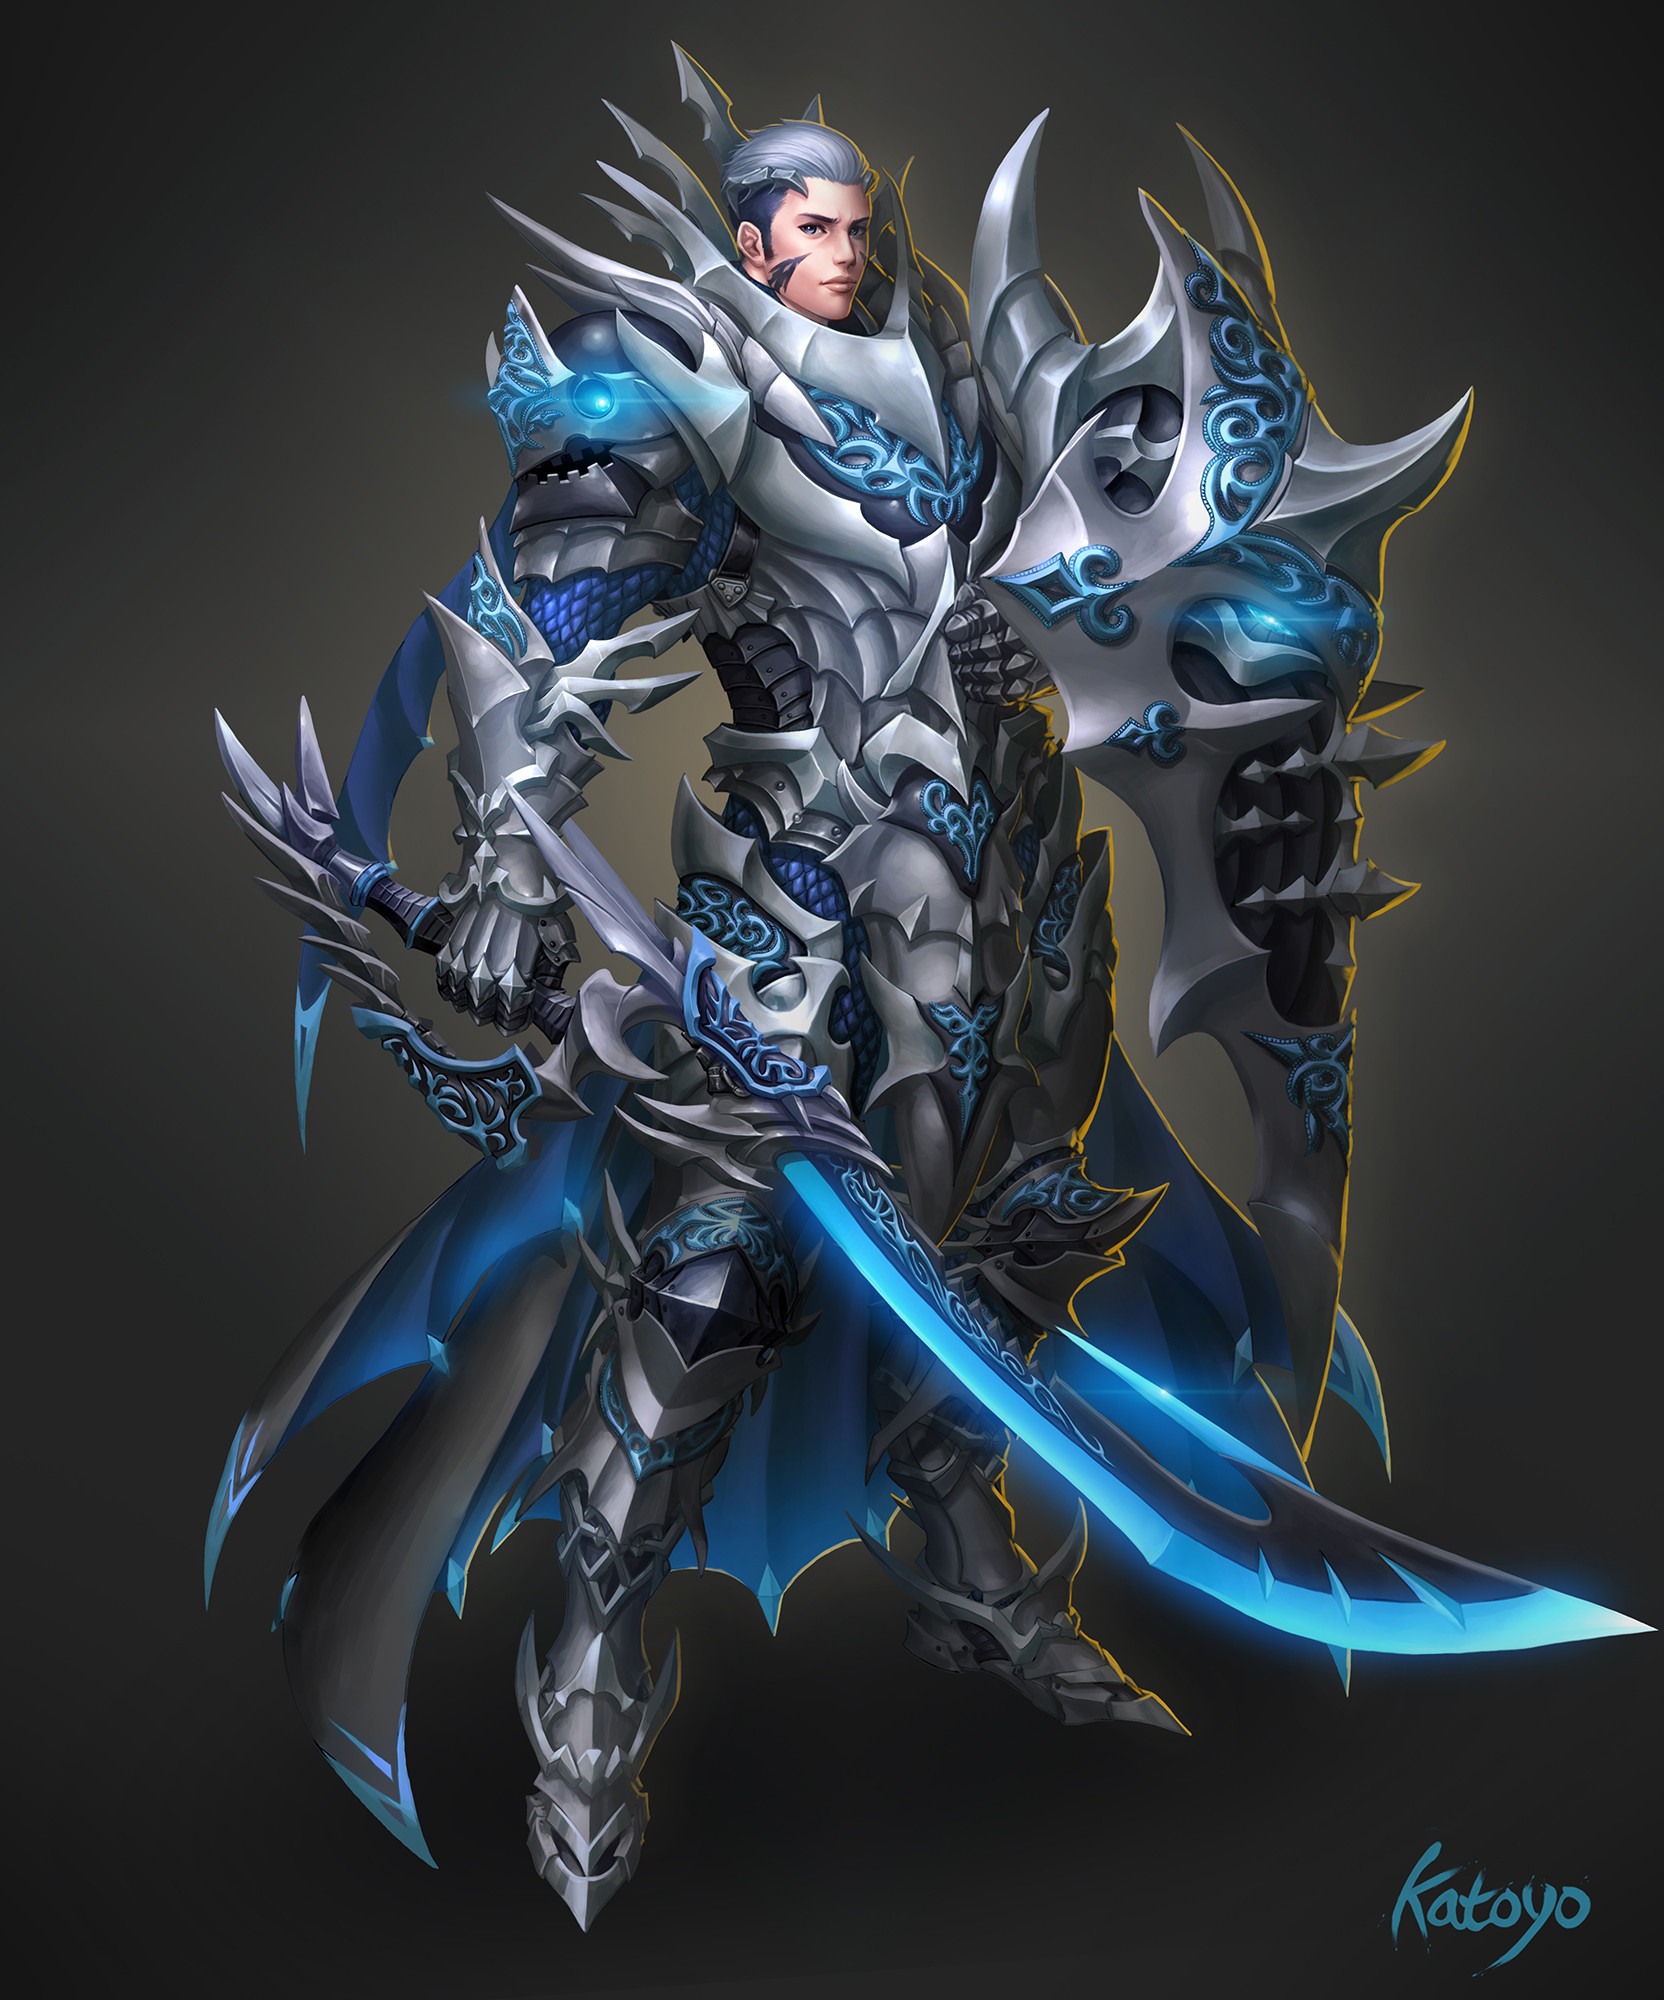 Sanghyun yu knight03 katoyo